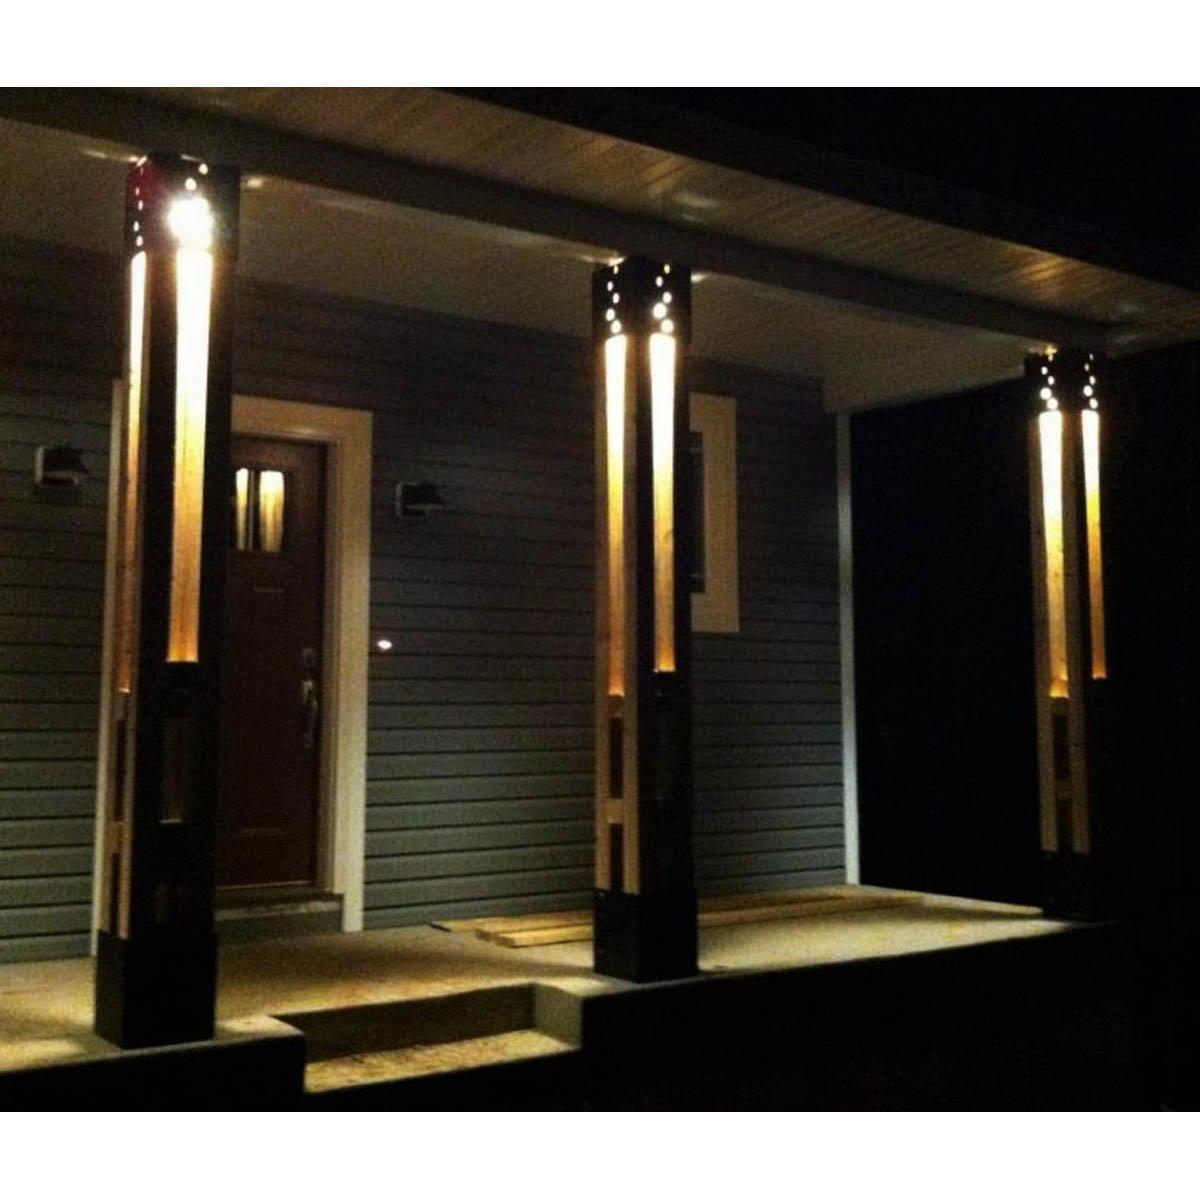 4 Piece Column Light Brackets Installed with Lighting